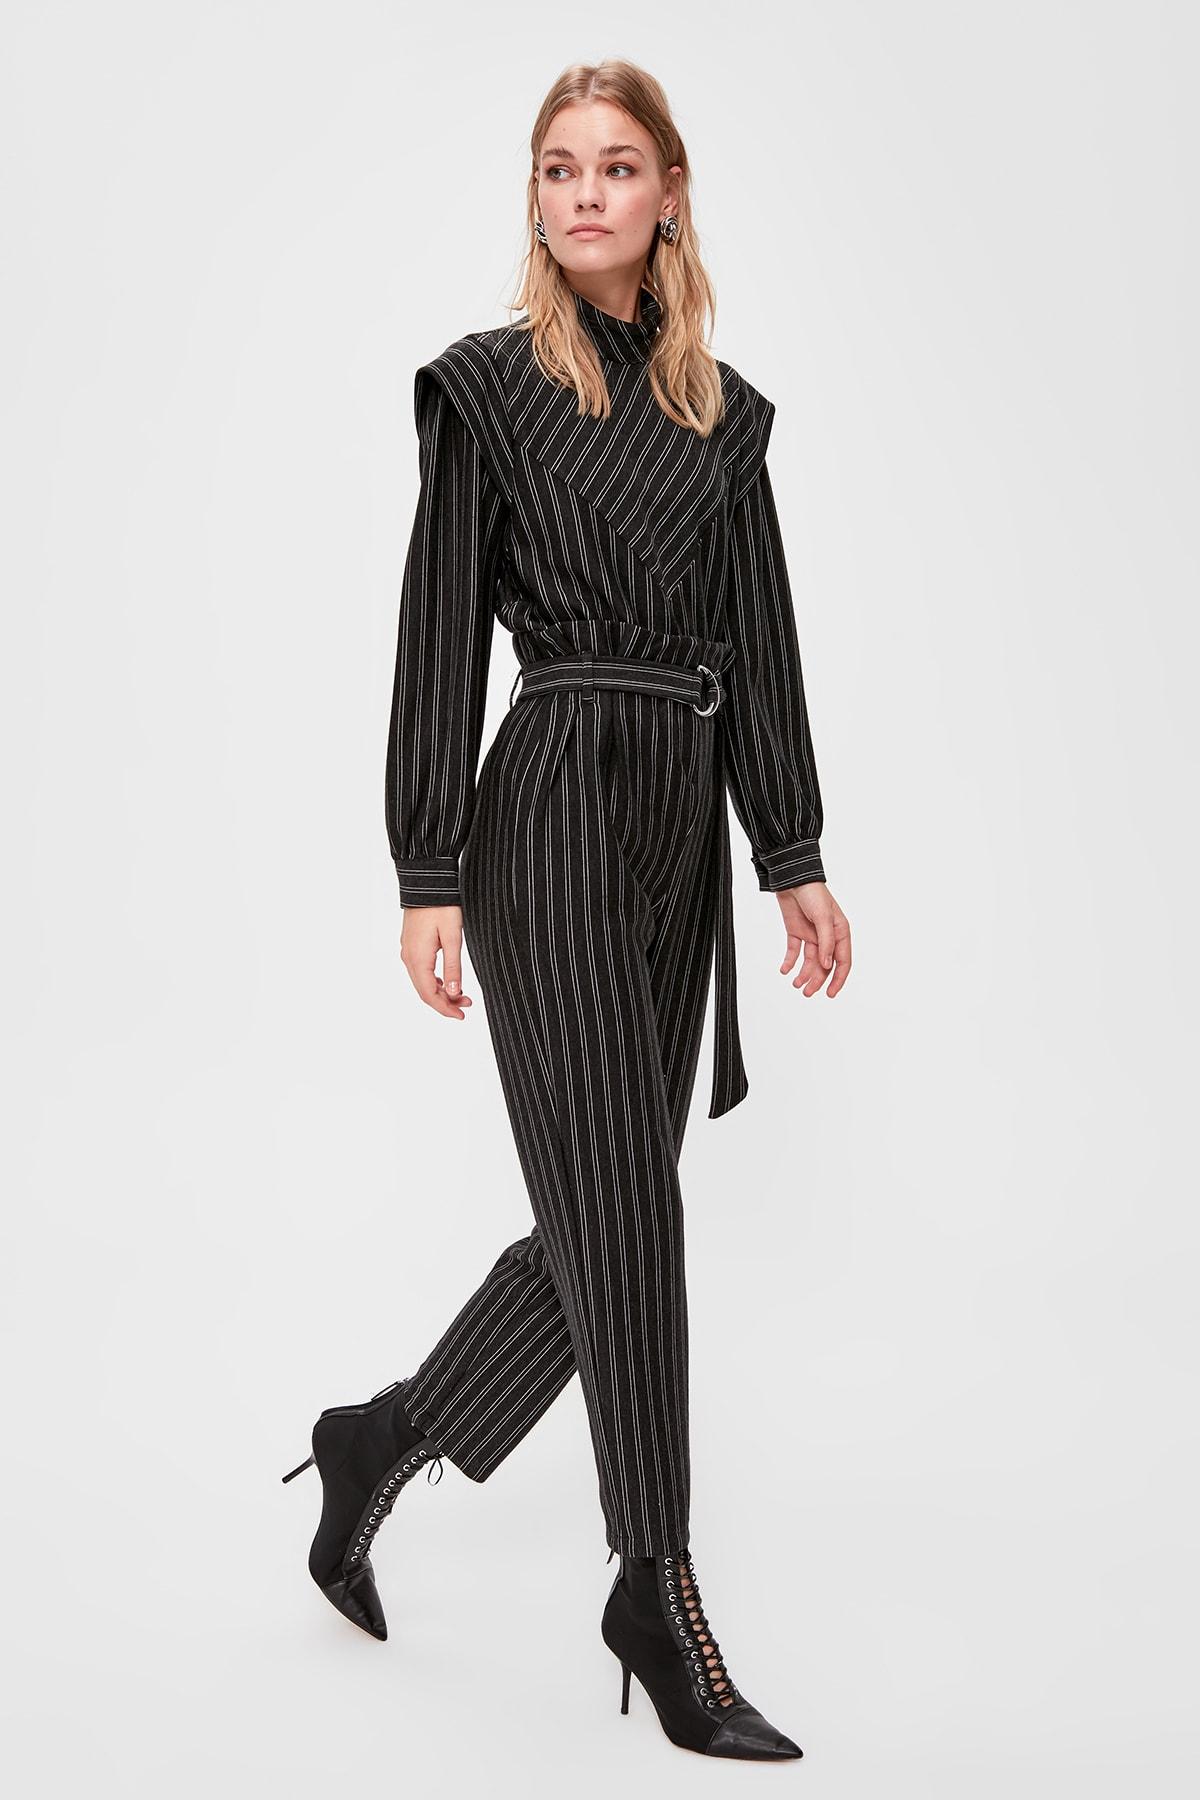 Trendyol Belt Detail Striped Knit Pants TWOAW20PL0469